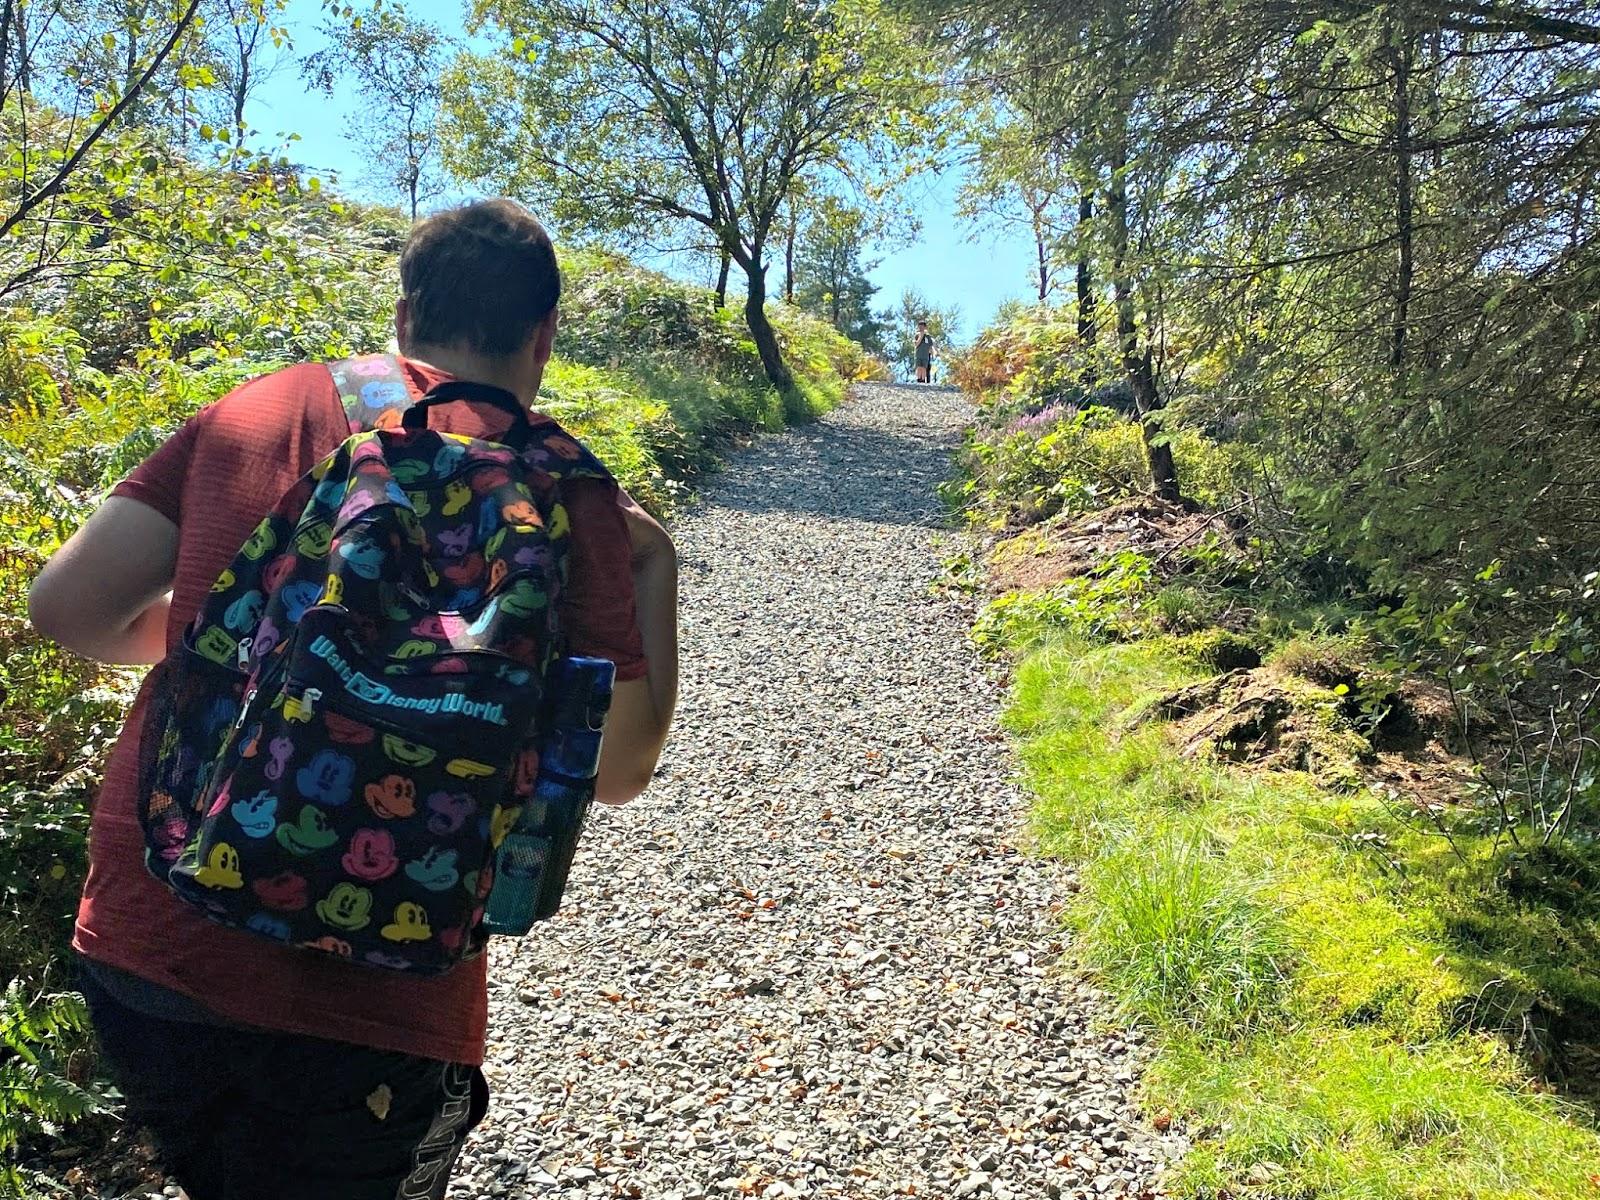 A boy walking up a steep hill